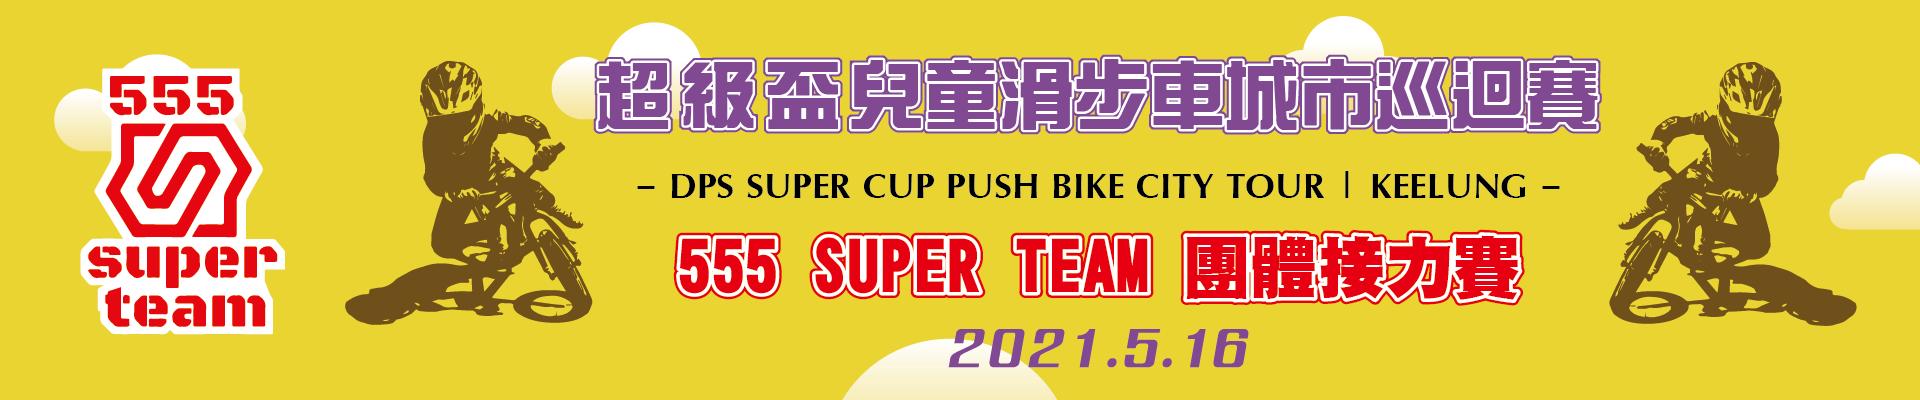 DPS超級盃 555 SUPER TEAM團體接力賽 - 基隆-主視覺